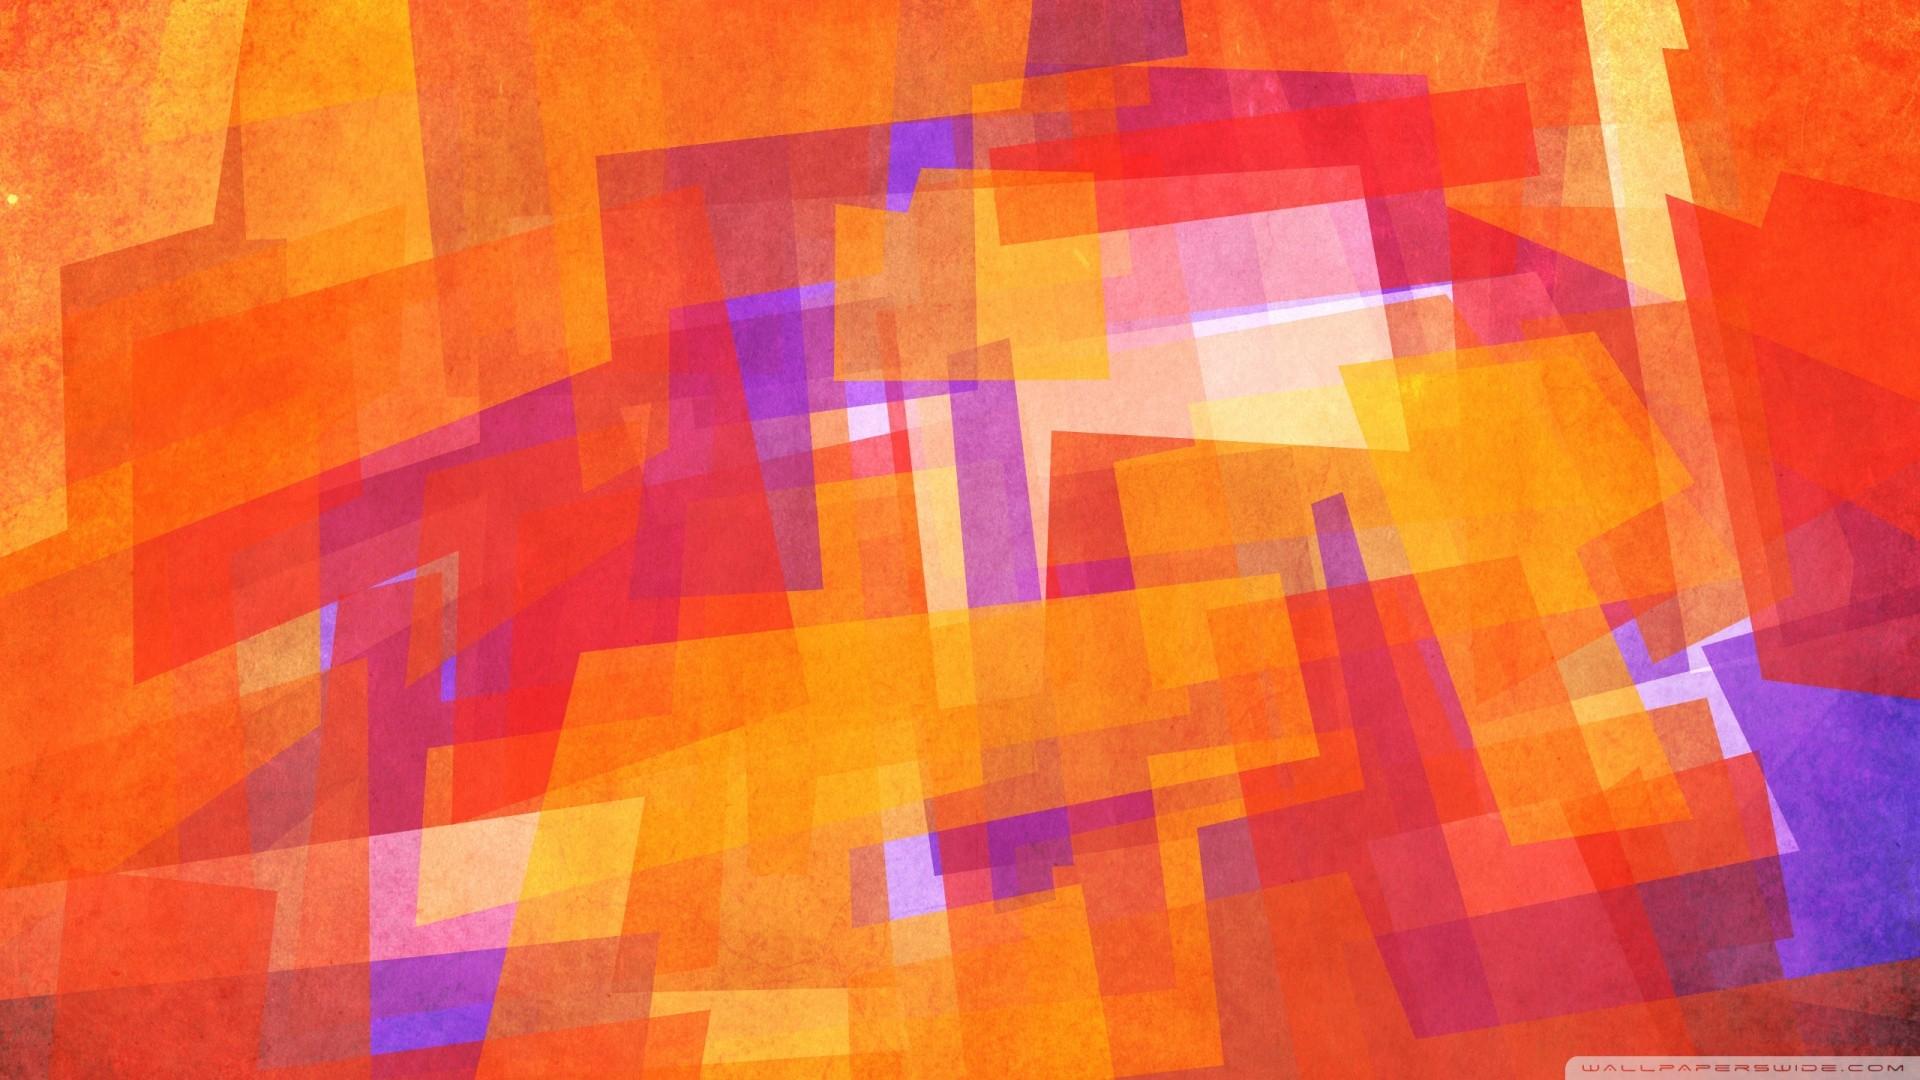 3d Cube Wallpaper Phone 35 Geometric Backgrounds 183 ① Download Free Full Hd